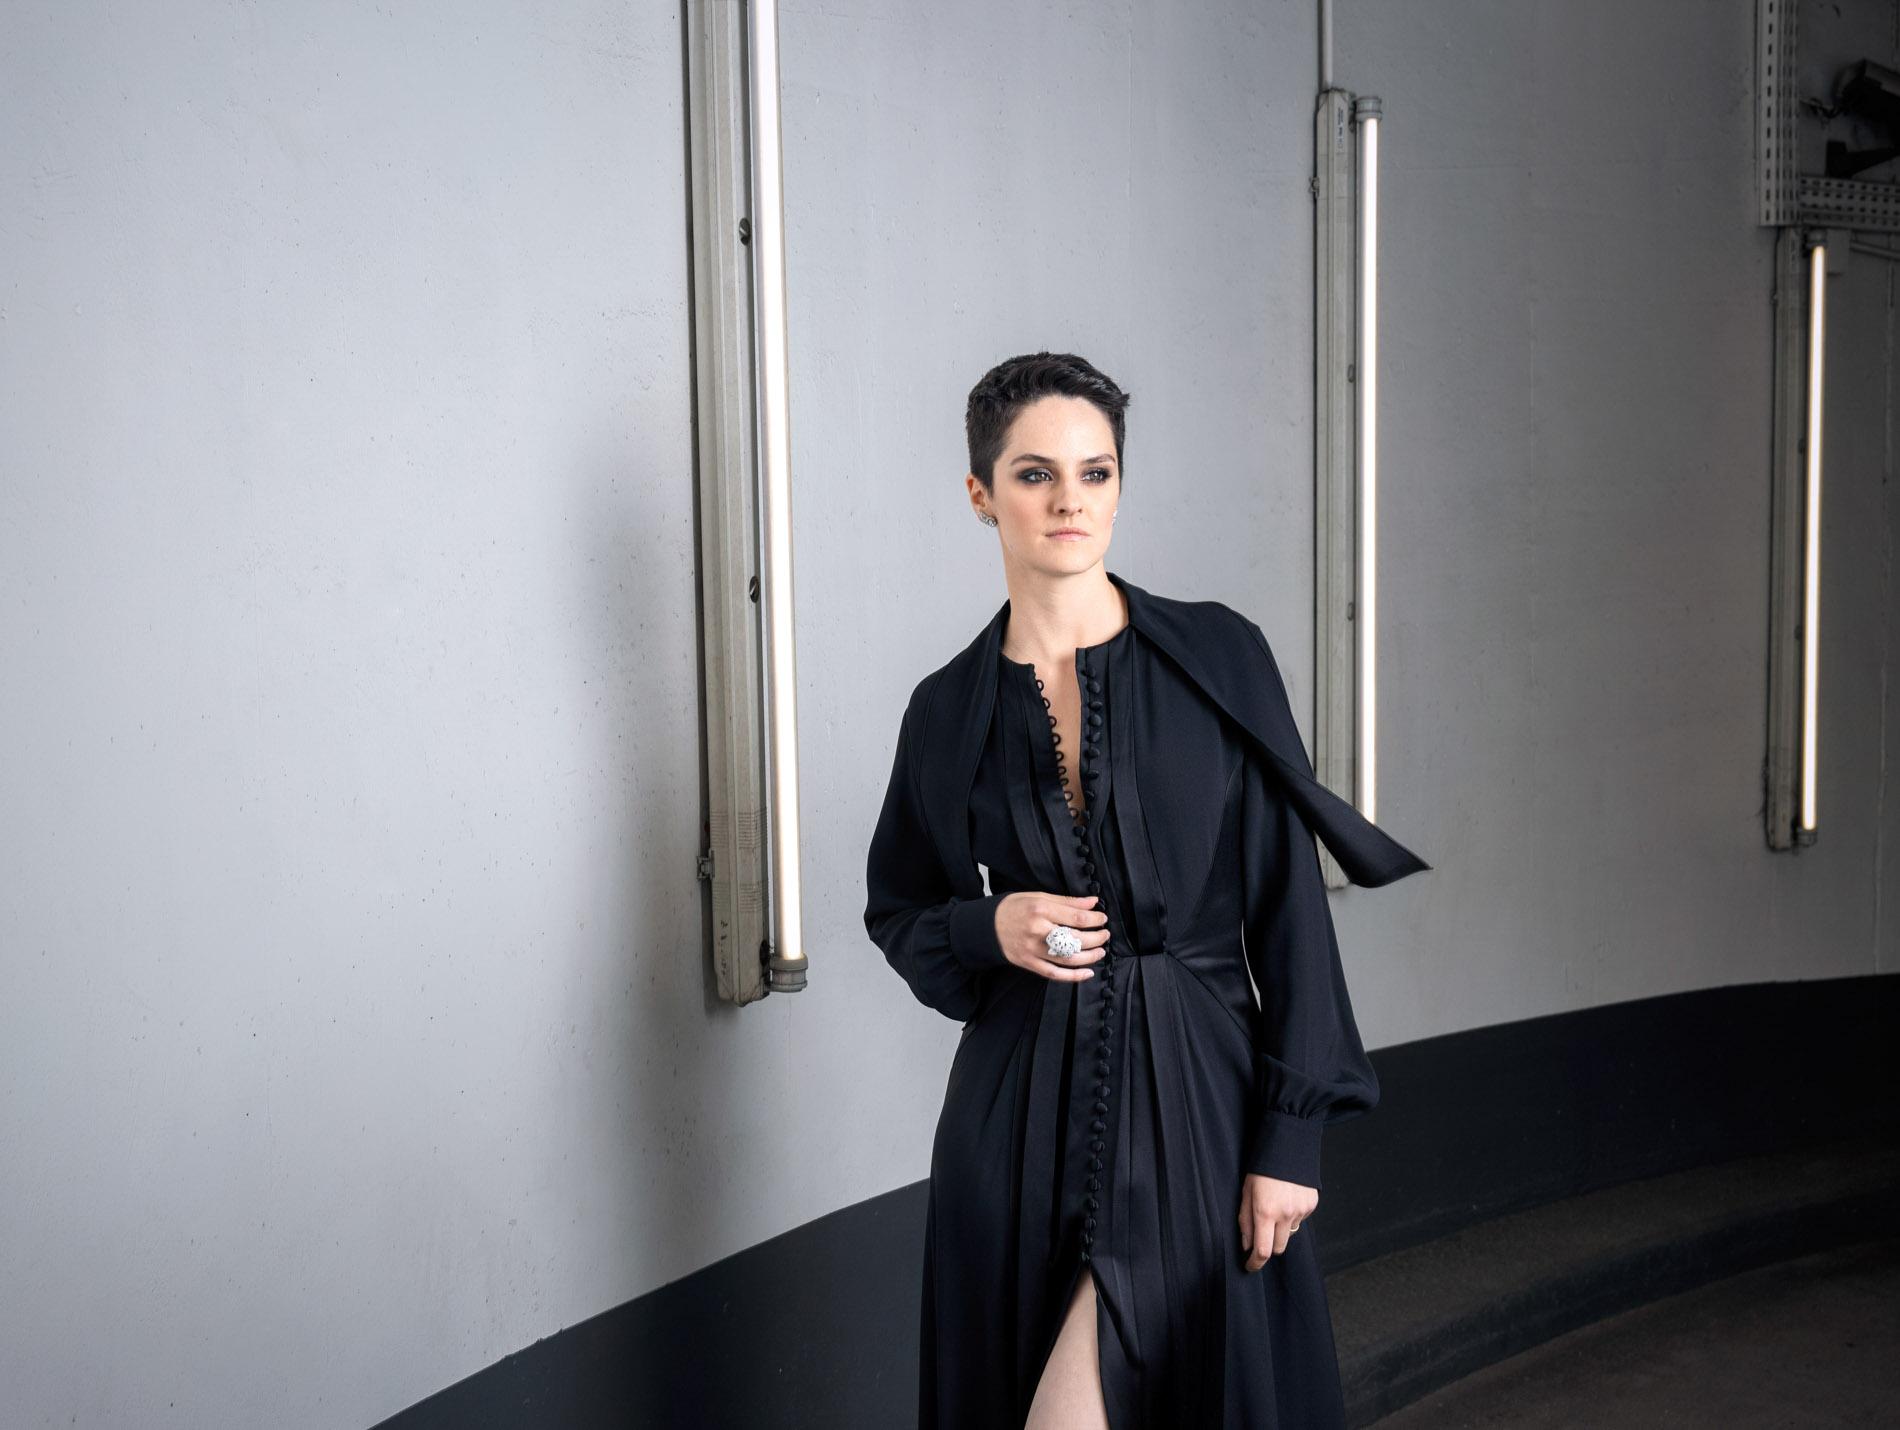 Actress Noémie Merlant